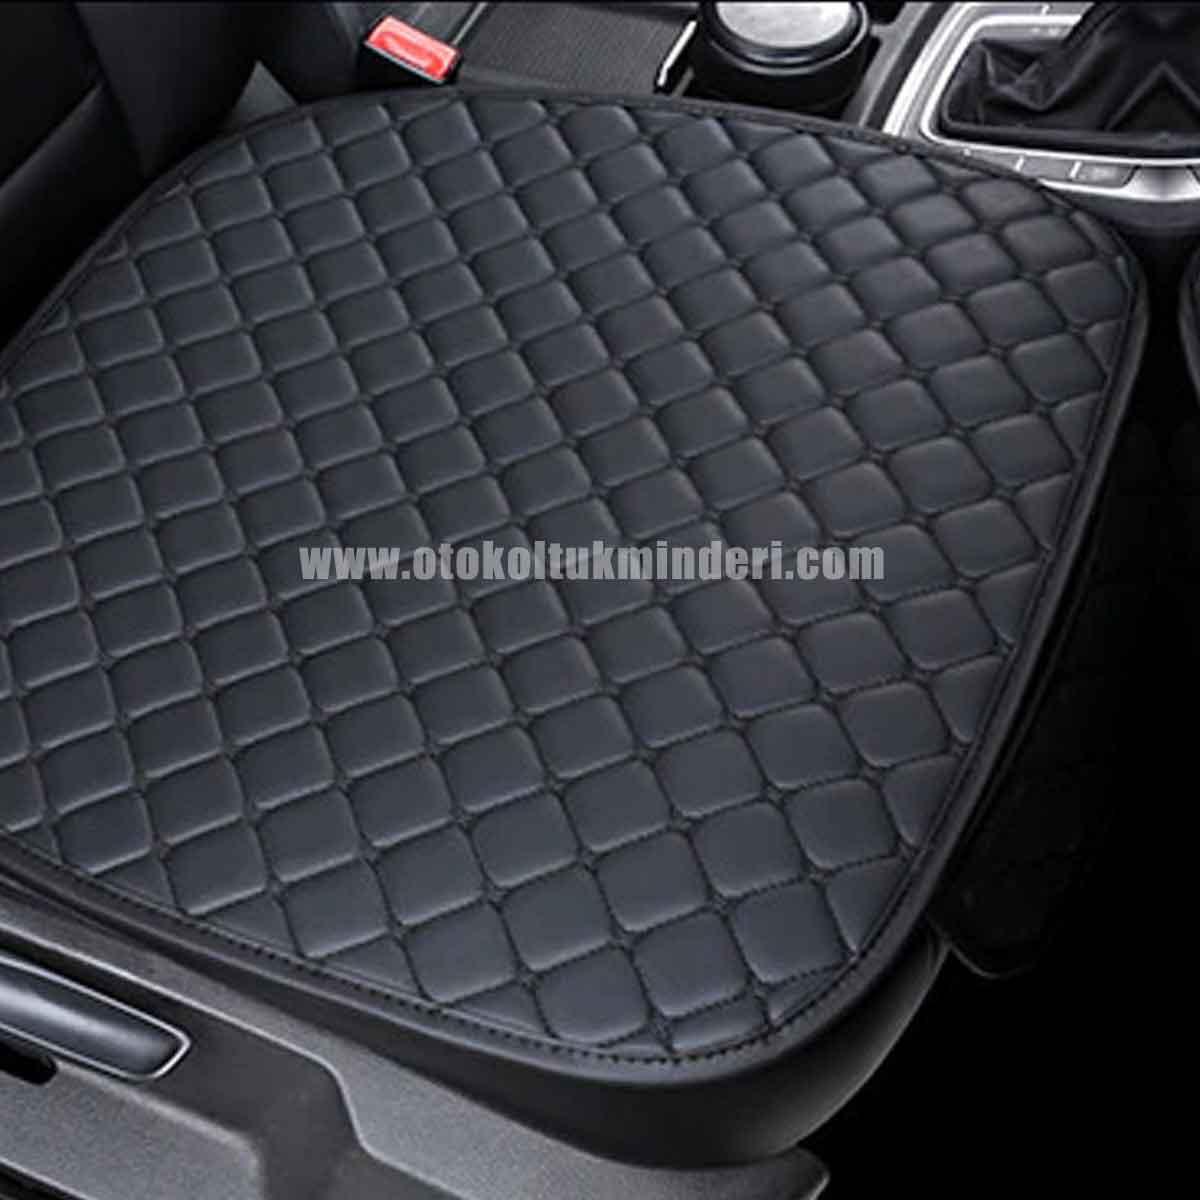 Mini oto koltuk kılıfı - Mini Koltuk minderi Siyah Deri Cepli